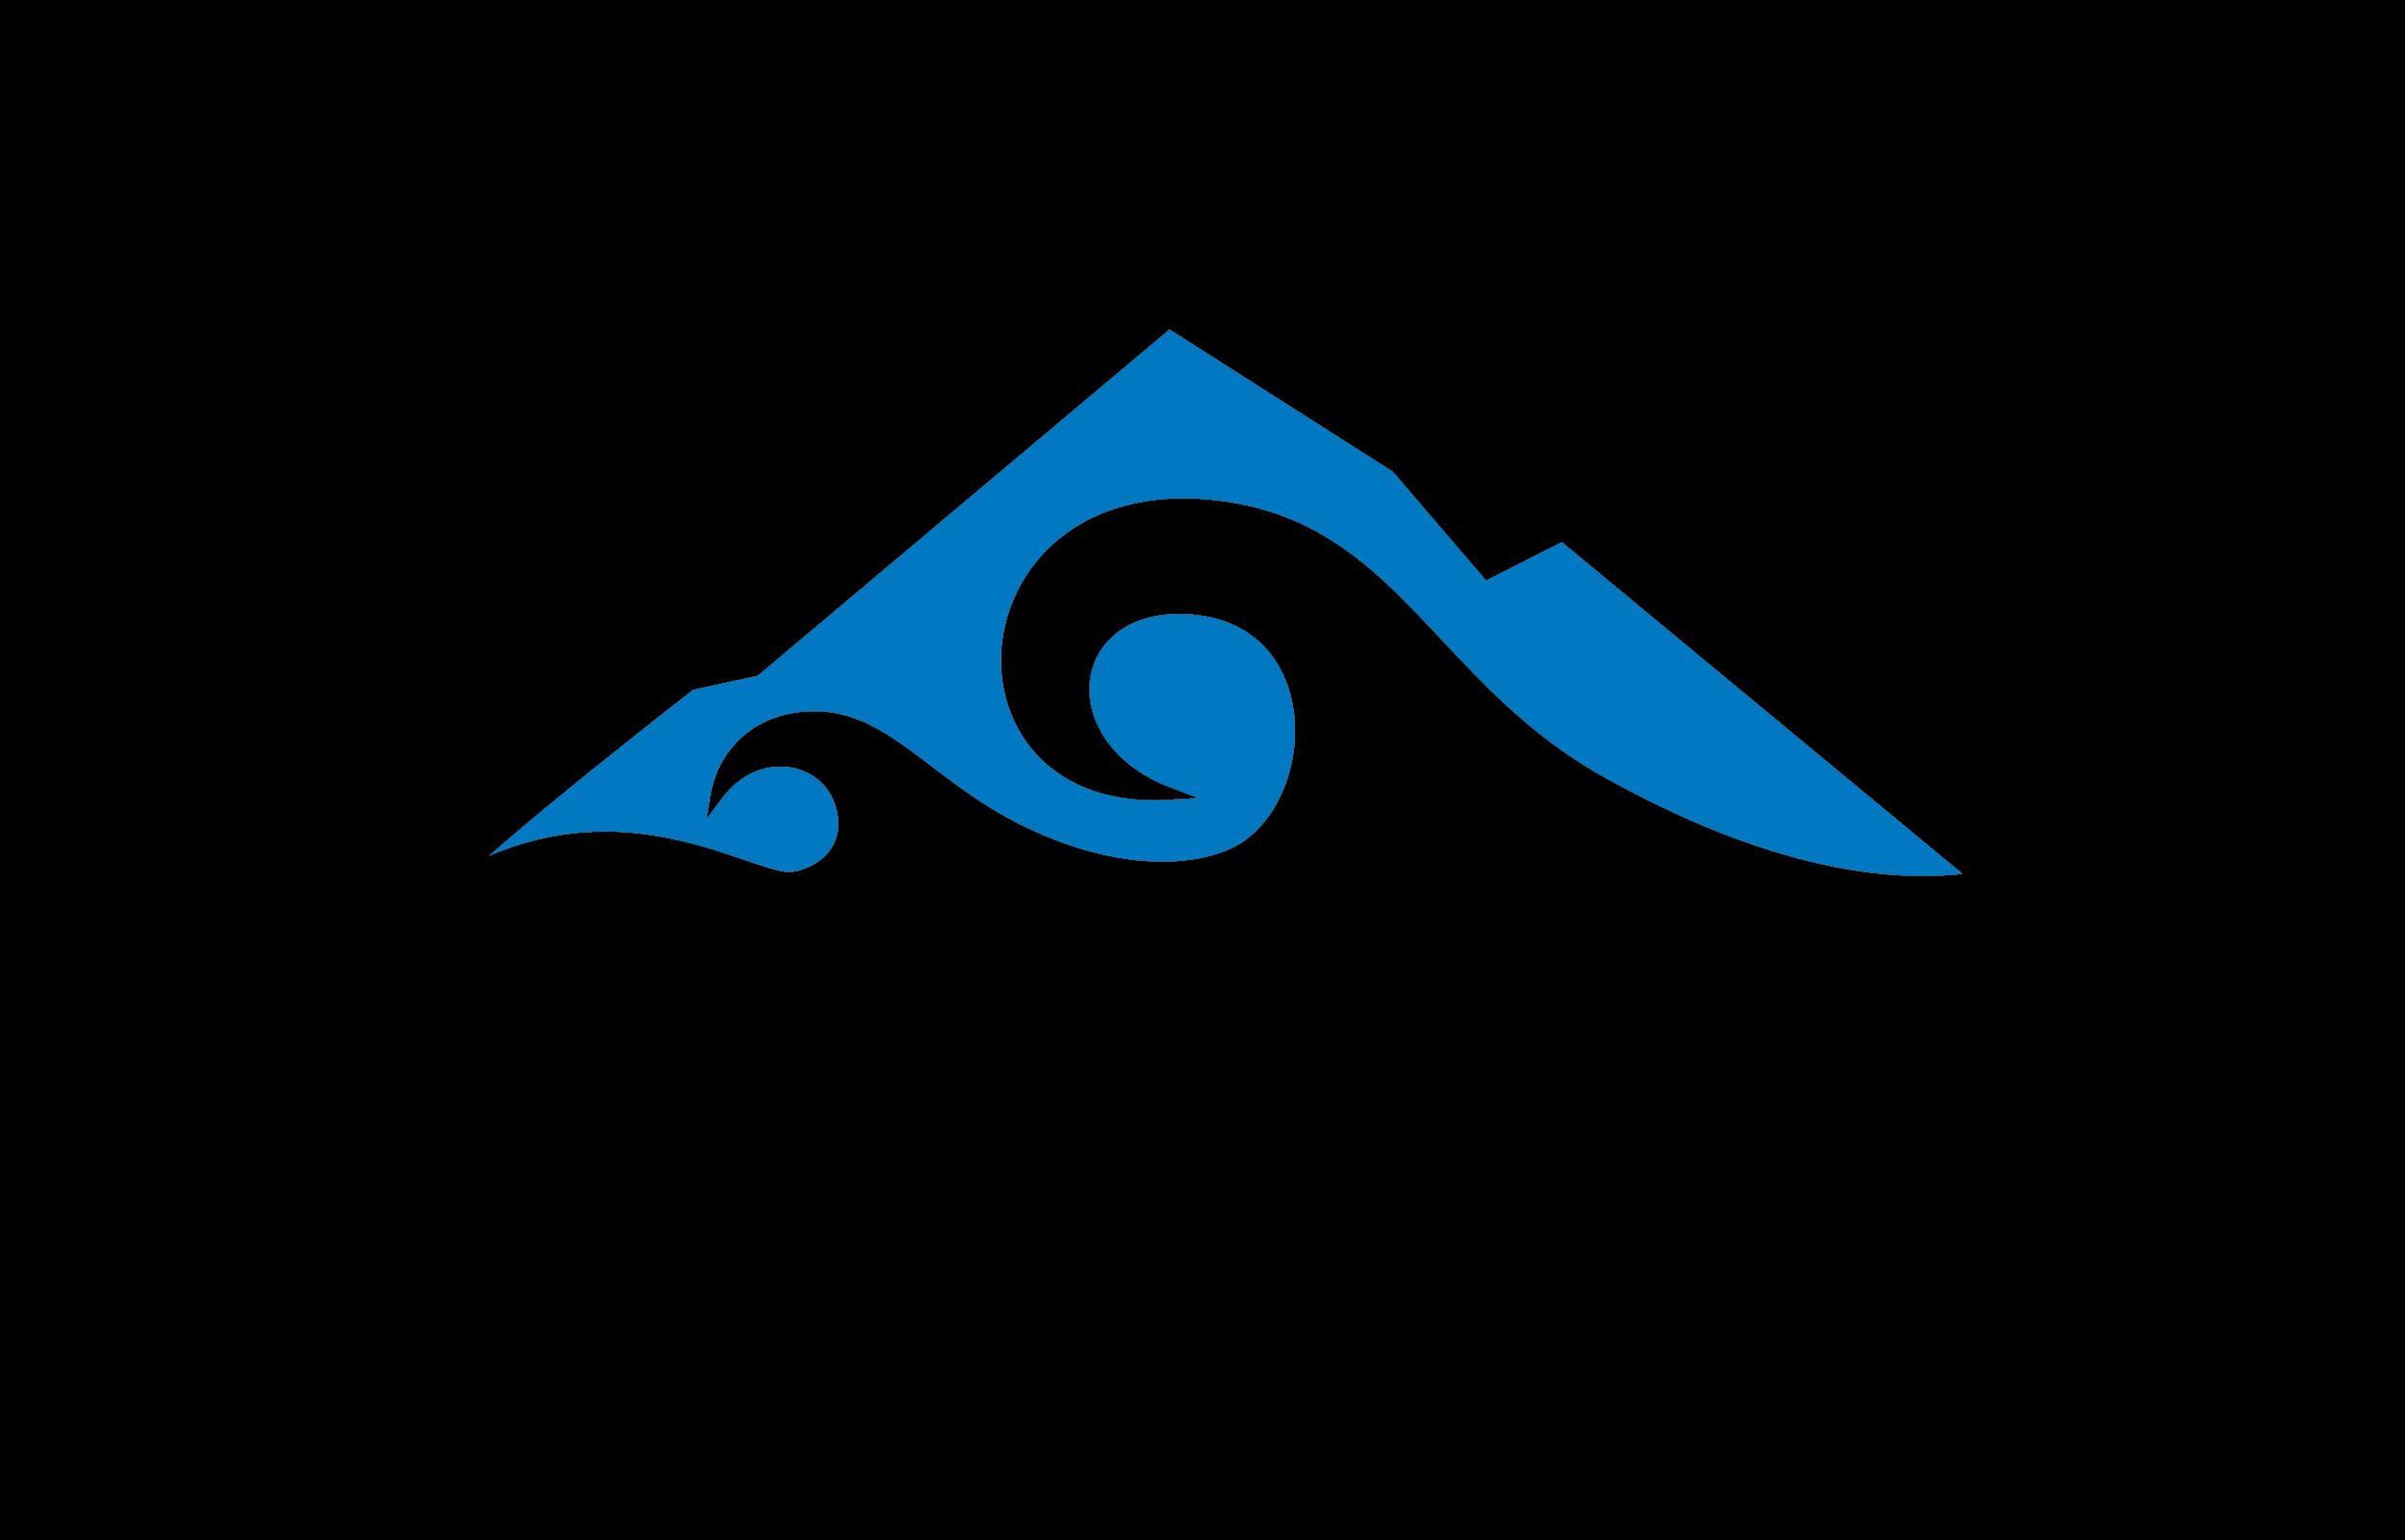 HTC_Logo no relay_HTC_Logo no Relay.png